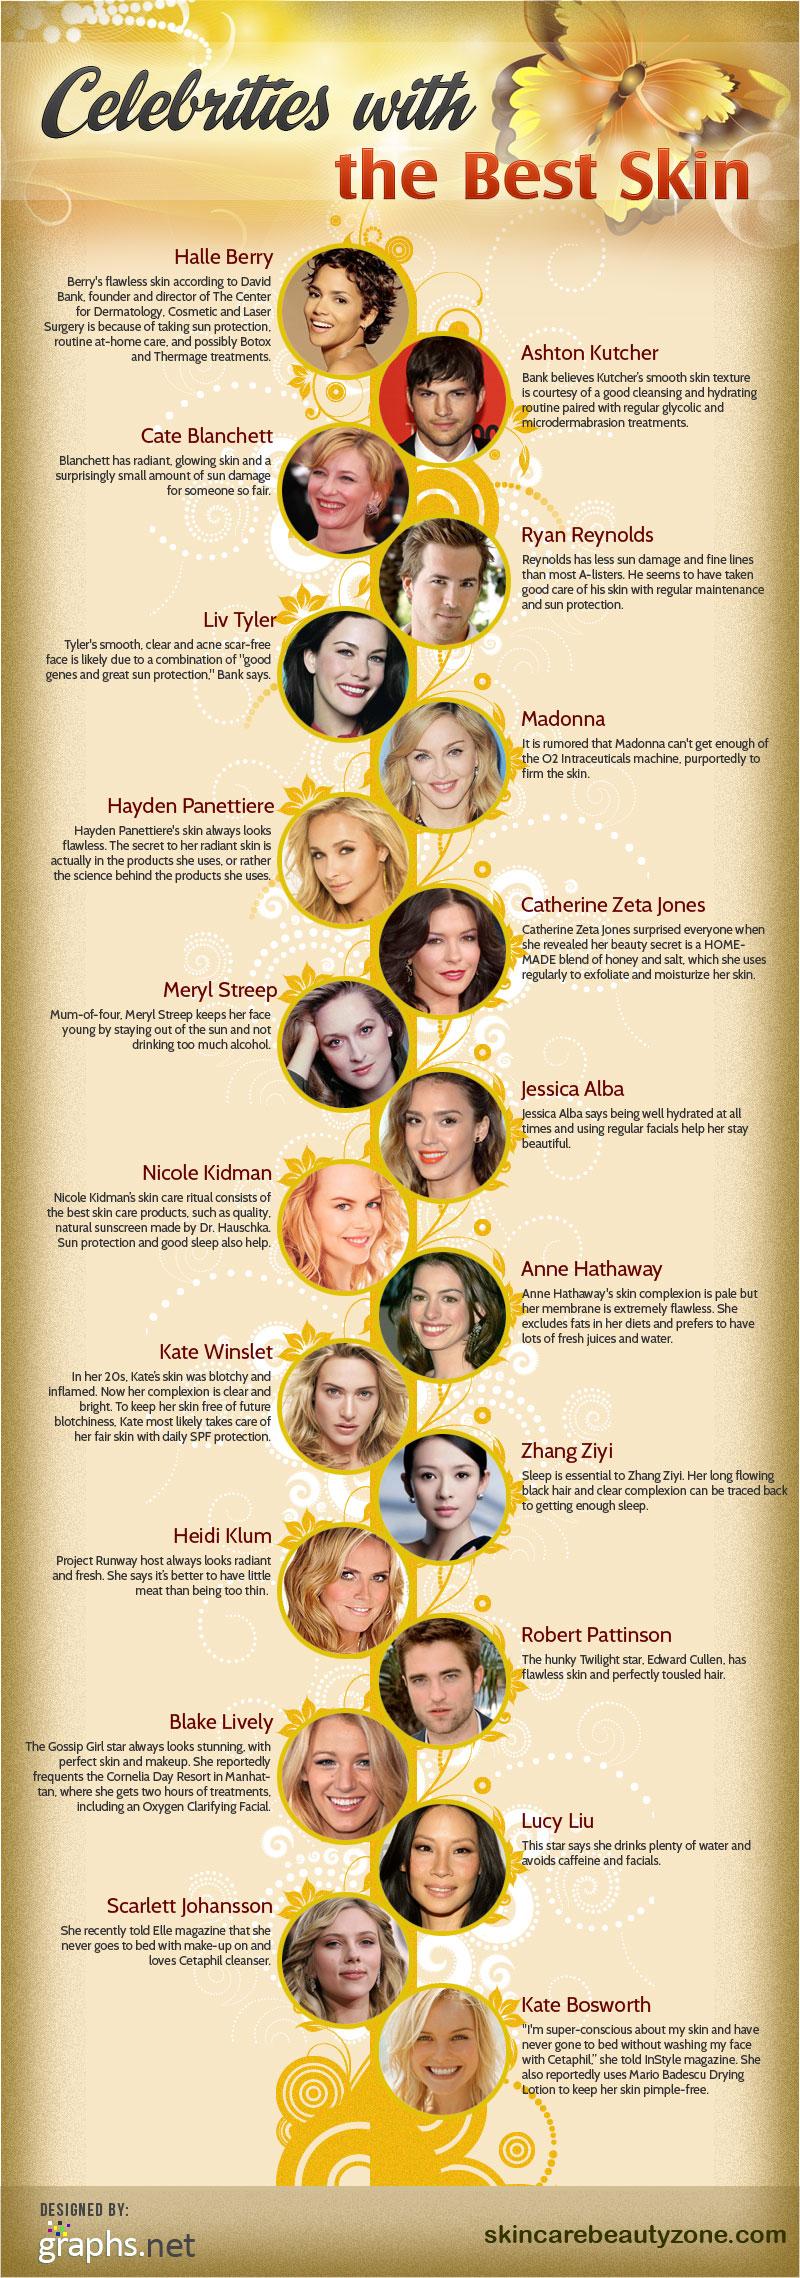 Celebrities Skin Care Secrets-Infographic